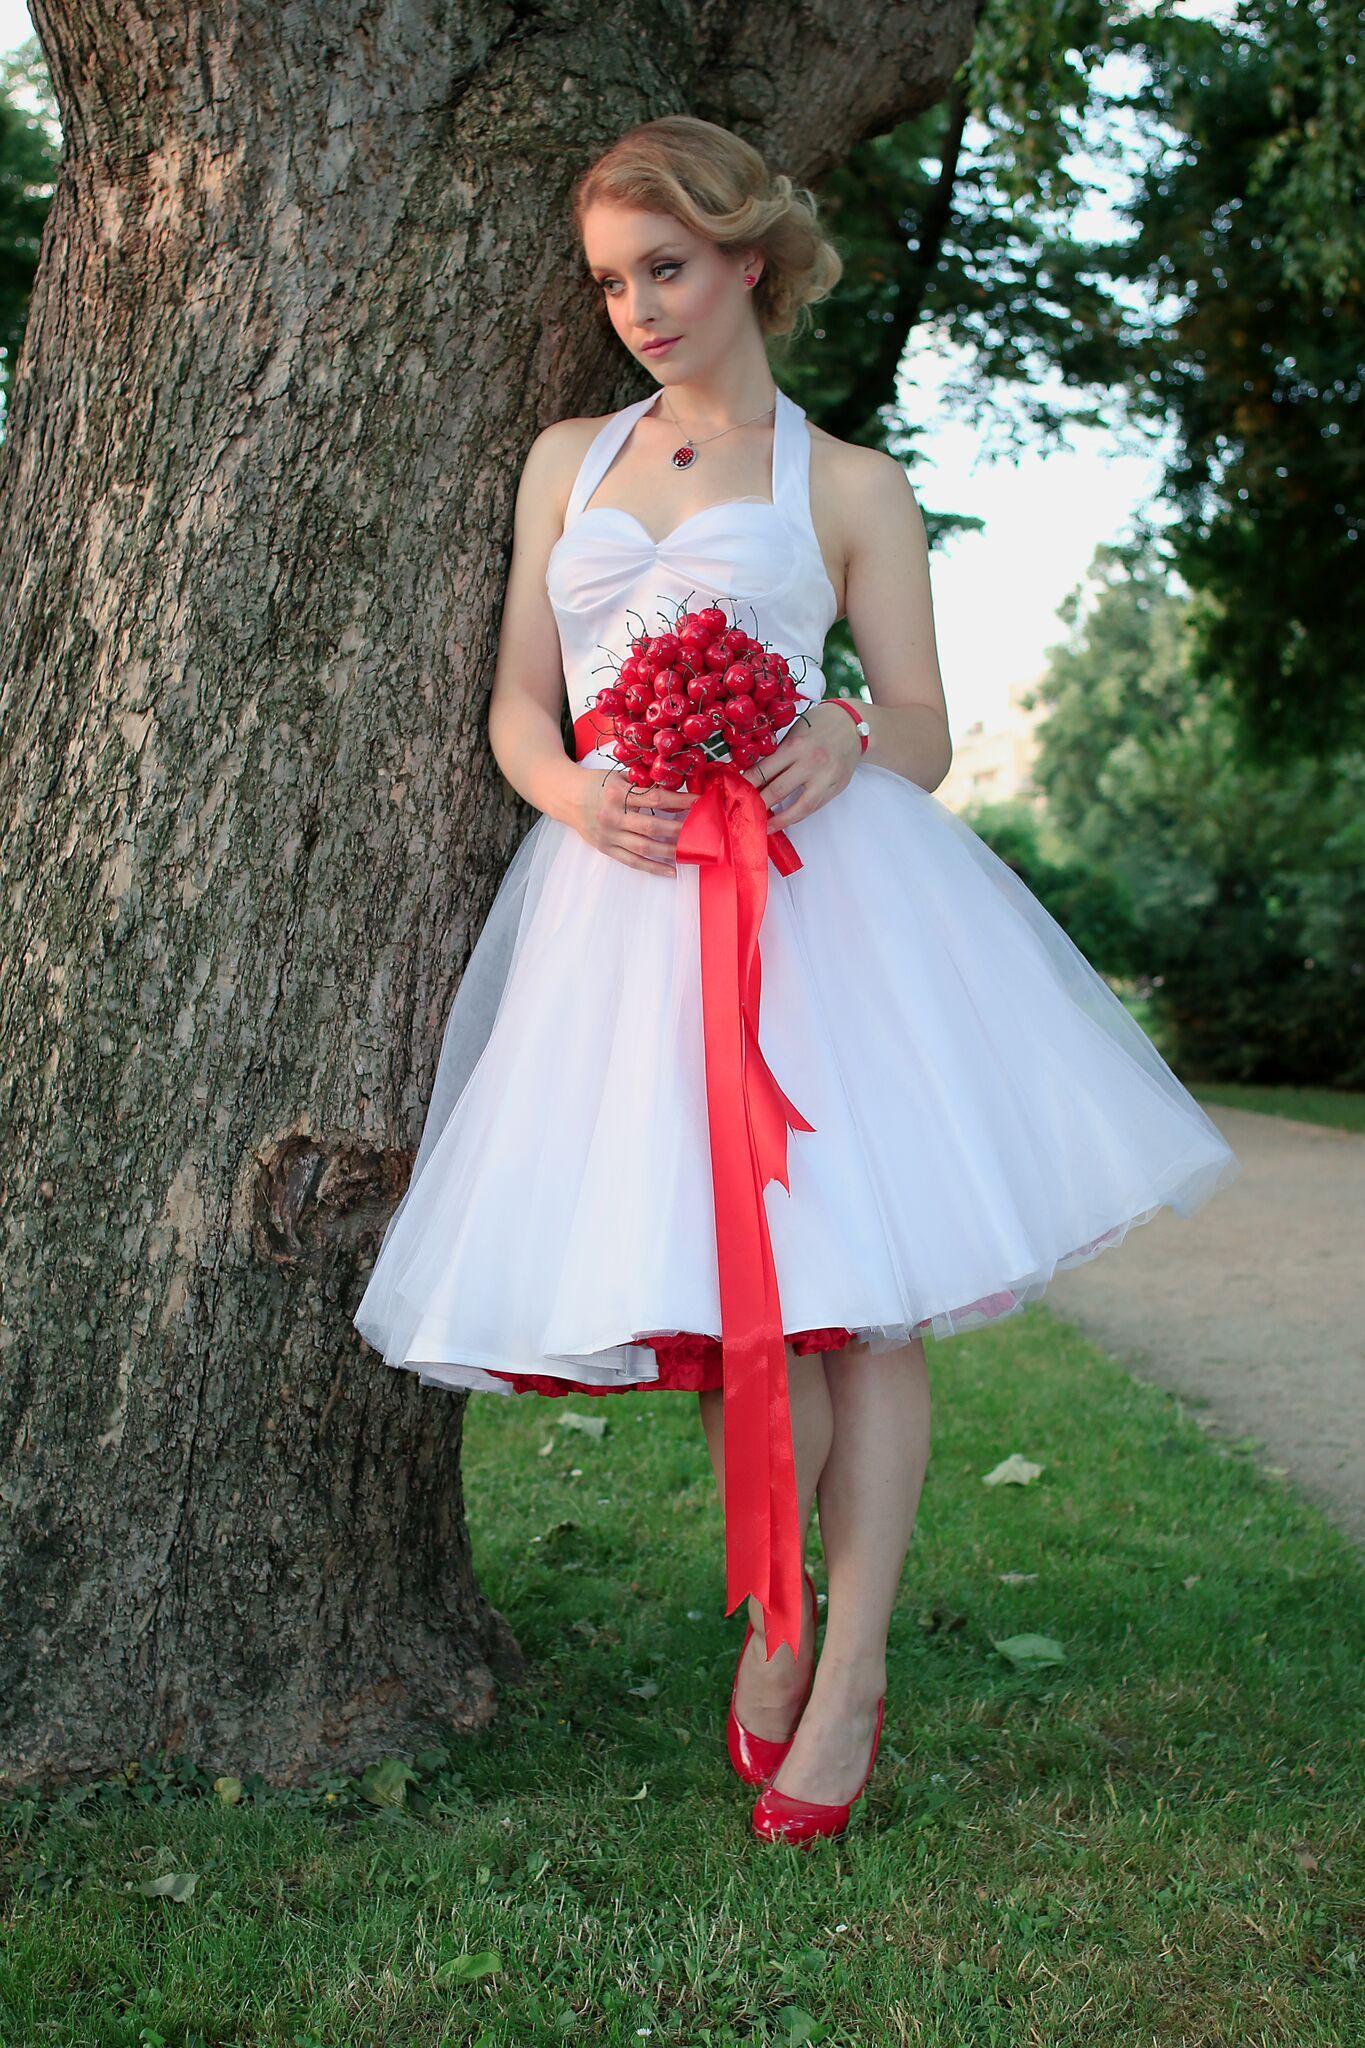 rockabilly bride, rockabilly wedding dress, rockabilly cherry ...